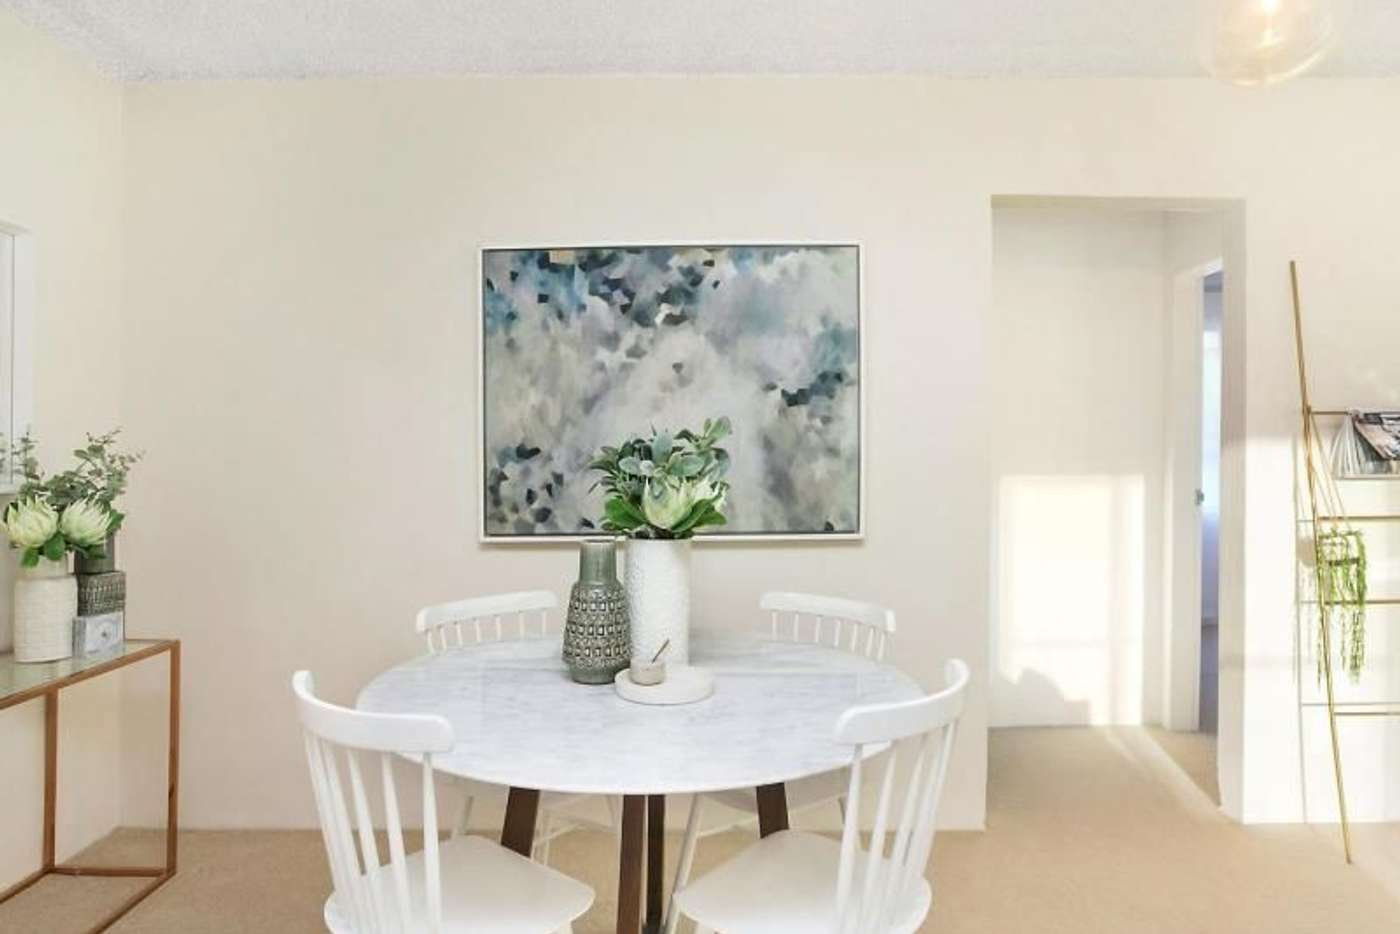 Main view of Homely apartment listing, 6/2 Kynaston Avenue, Randwick NSW 2031